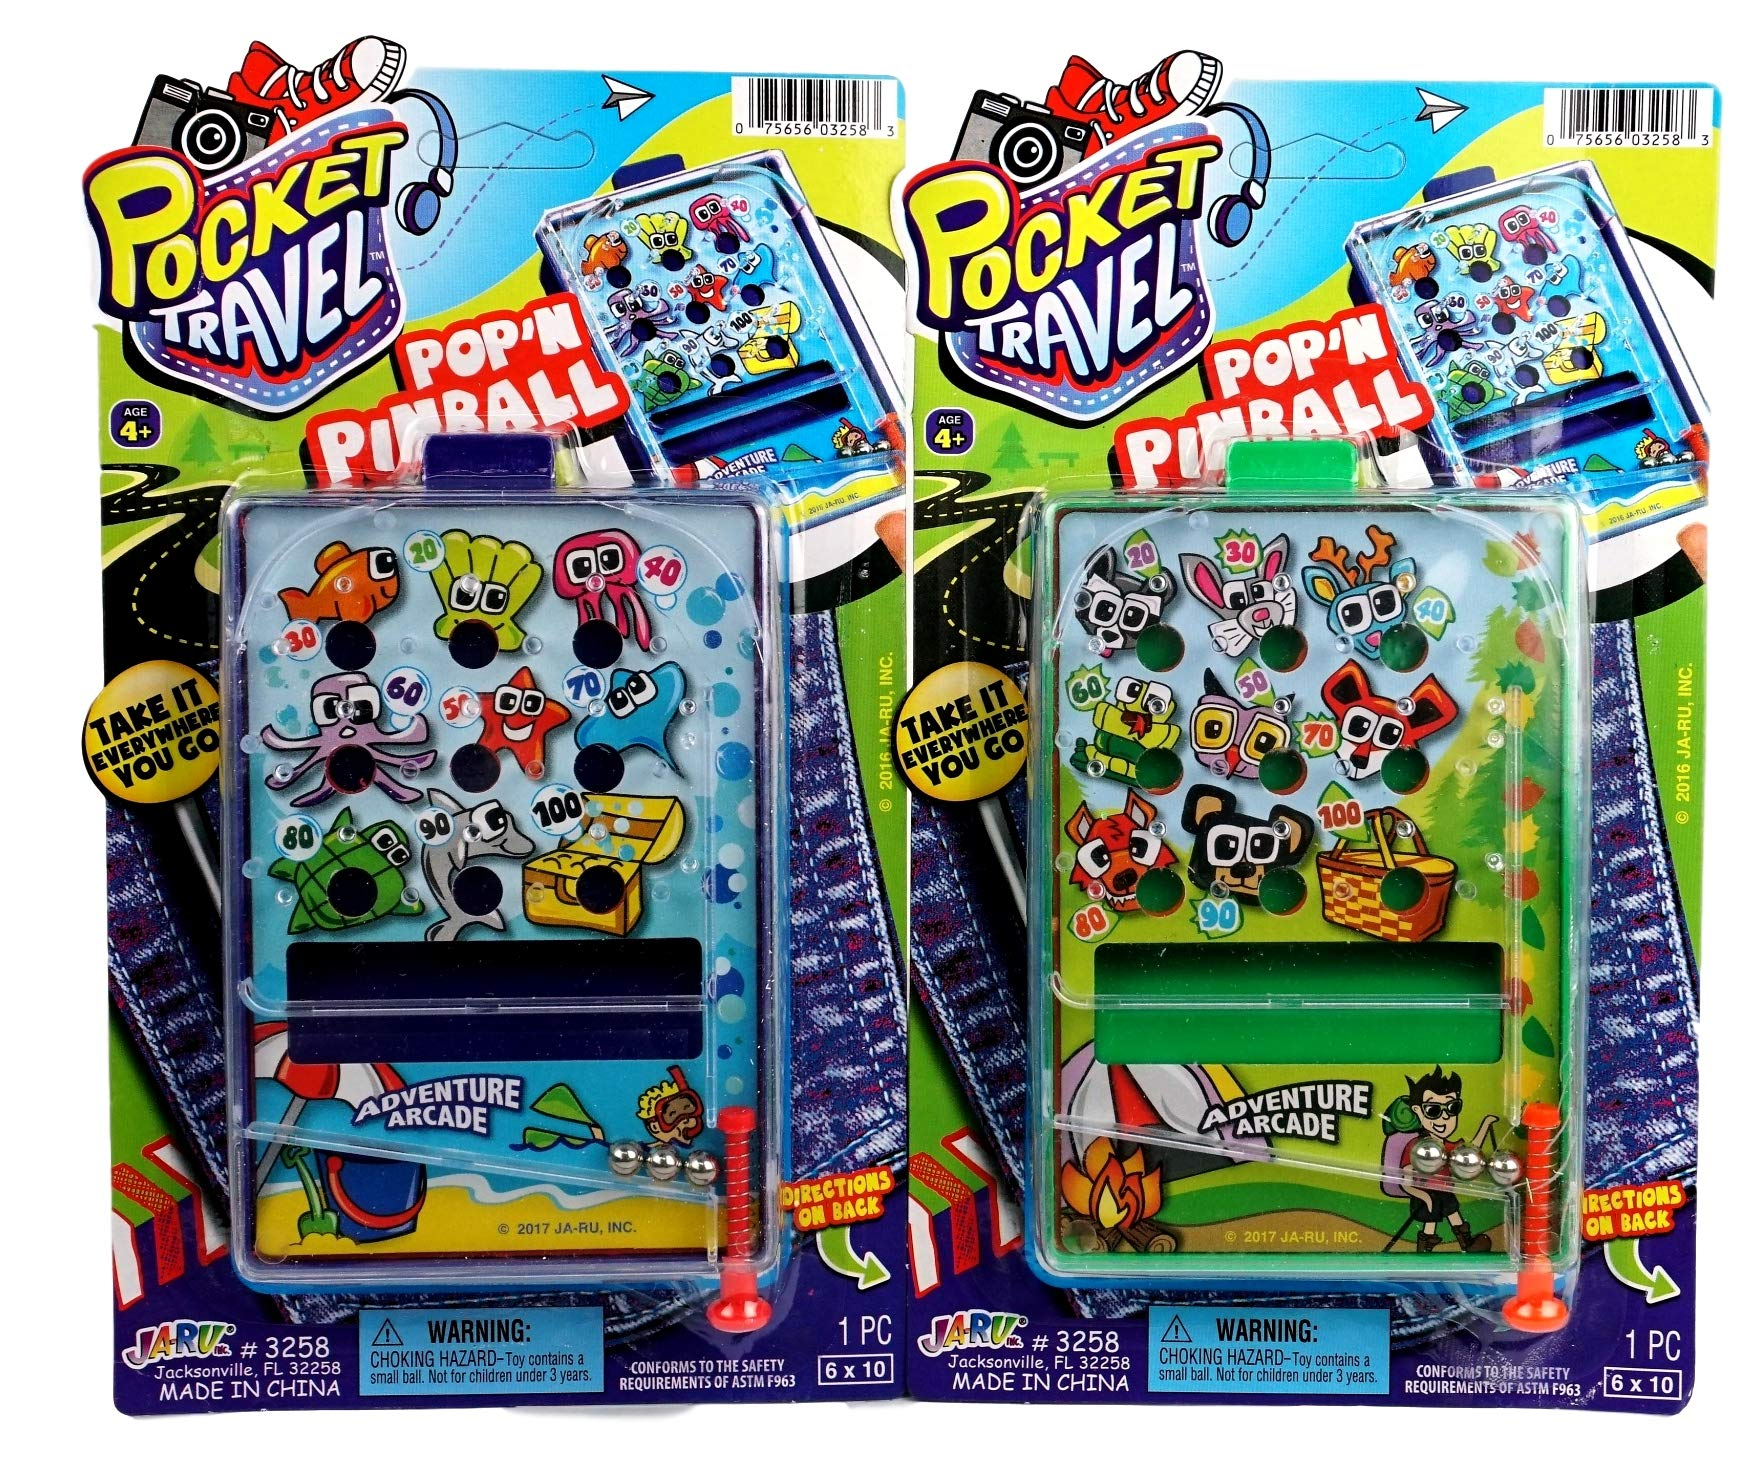 JA-RU Pinball Pocket Travel Game (144 Units) and one Bouncy Ball Item #3258-144p by JA-RU (Image #4)